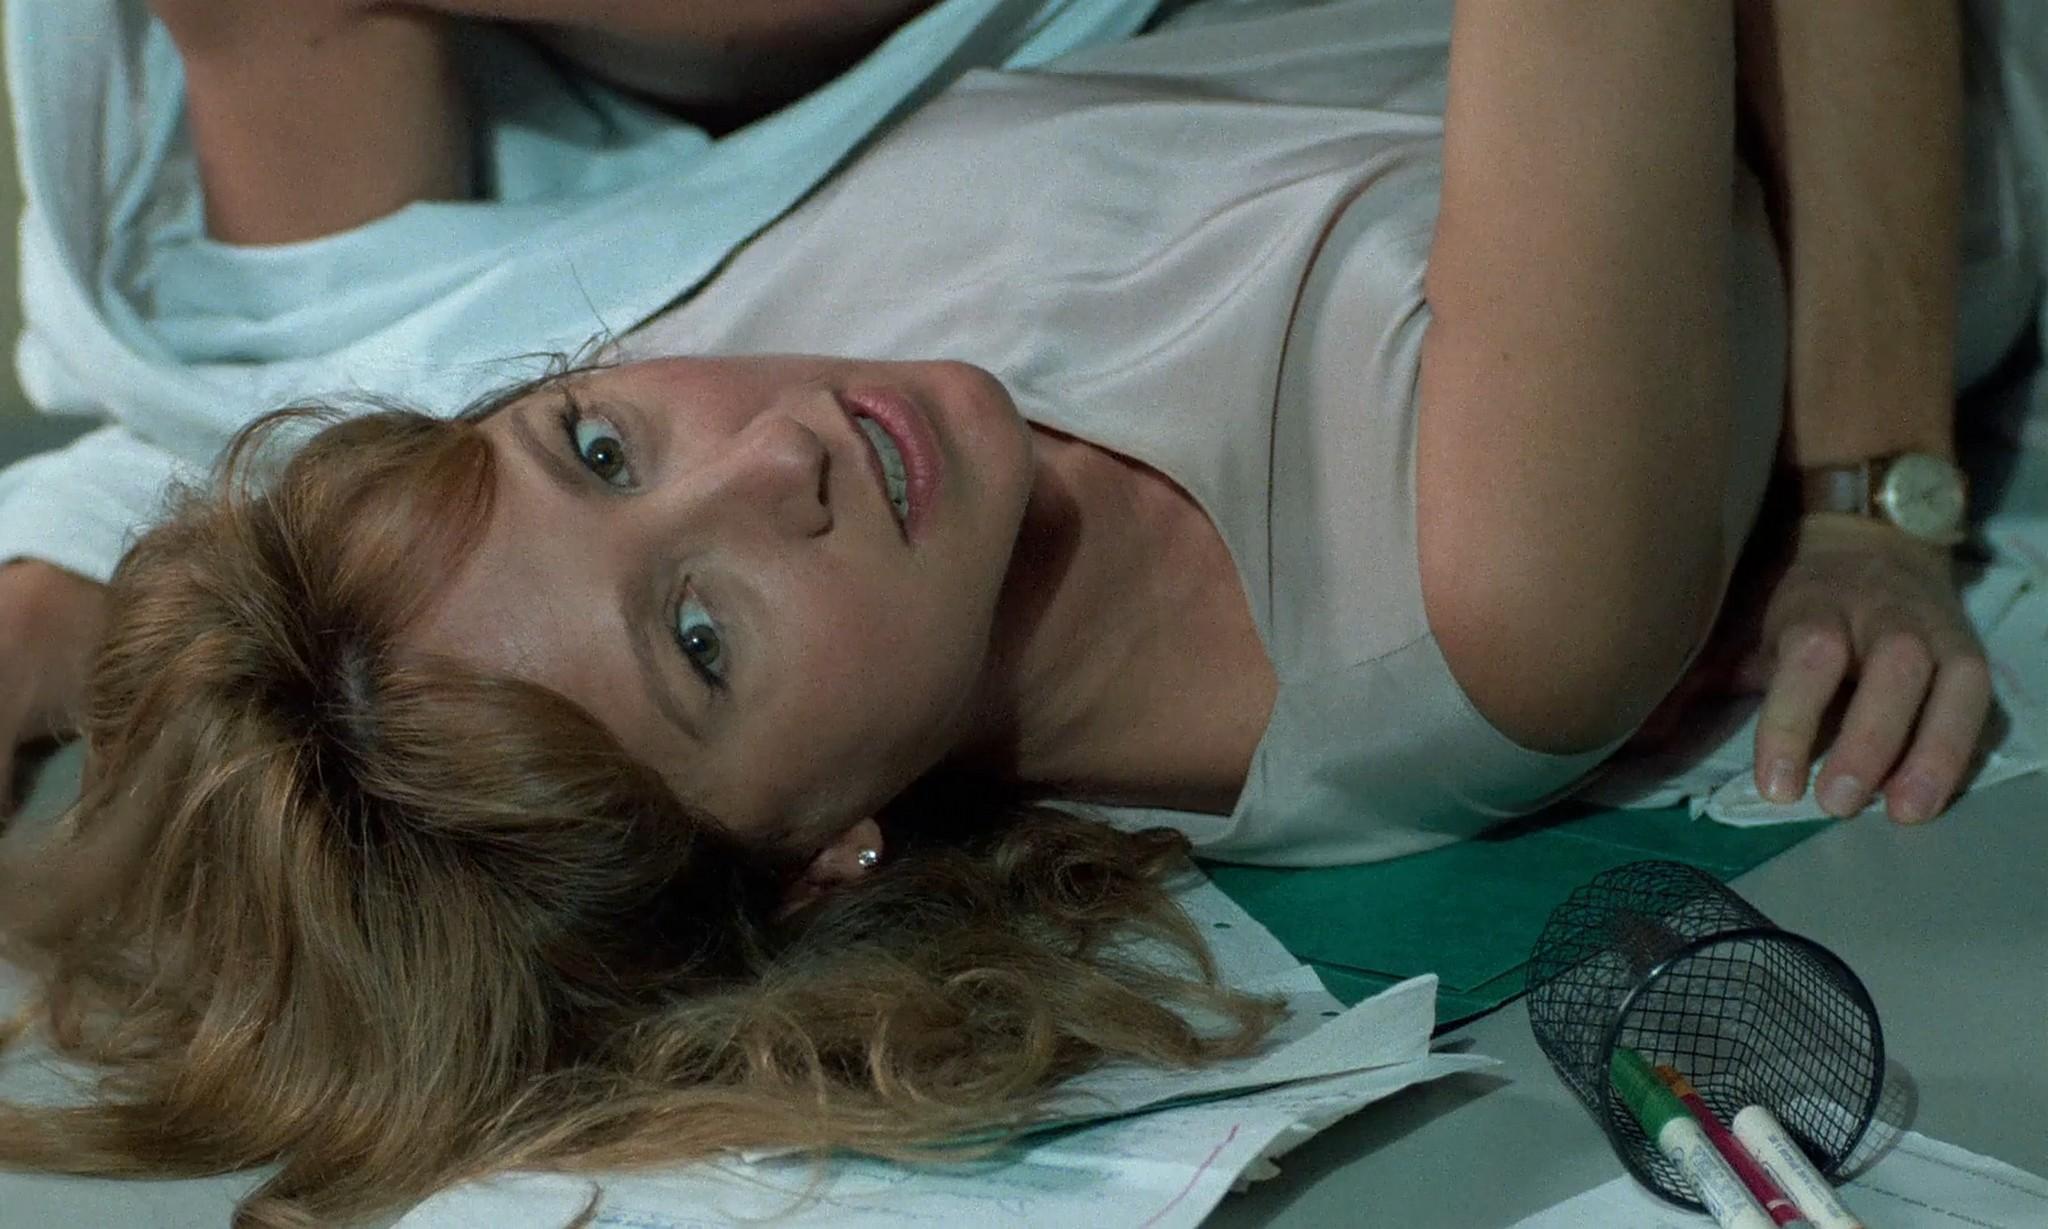 Nathalie Baye nude in the shower En toute innocence FR 1988 1080p BluRay 3